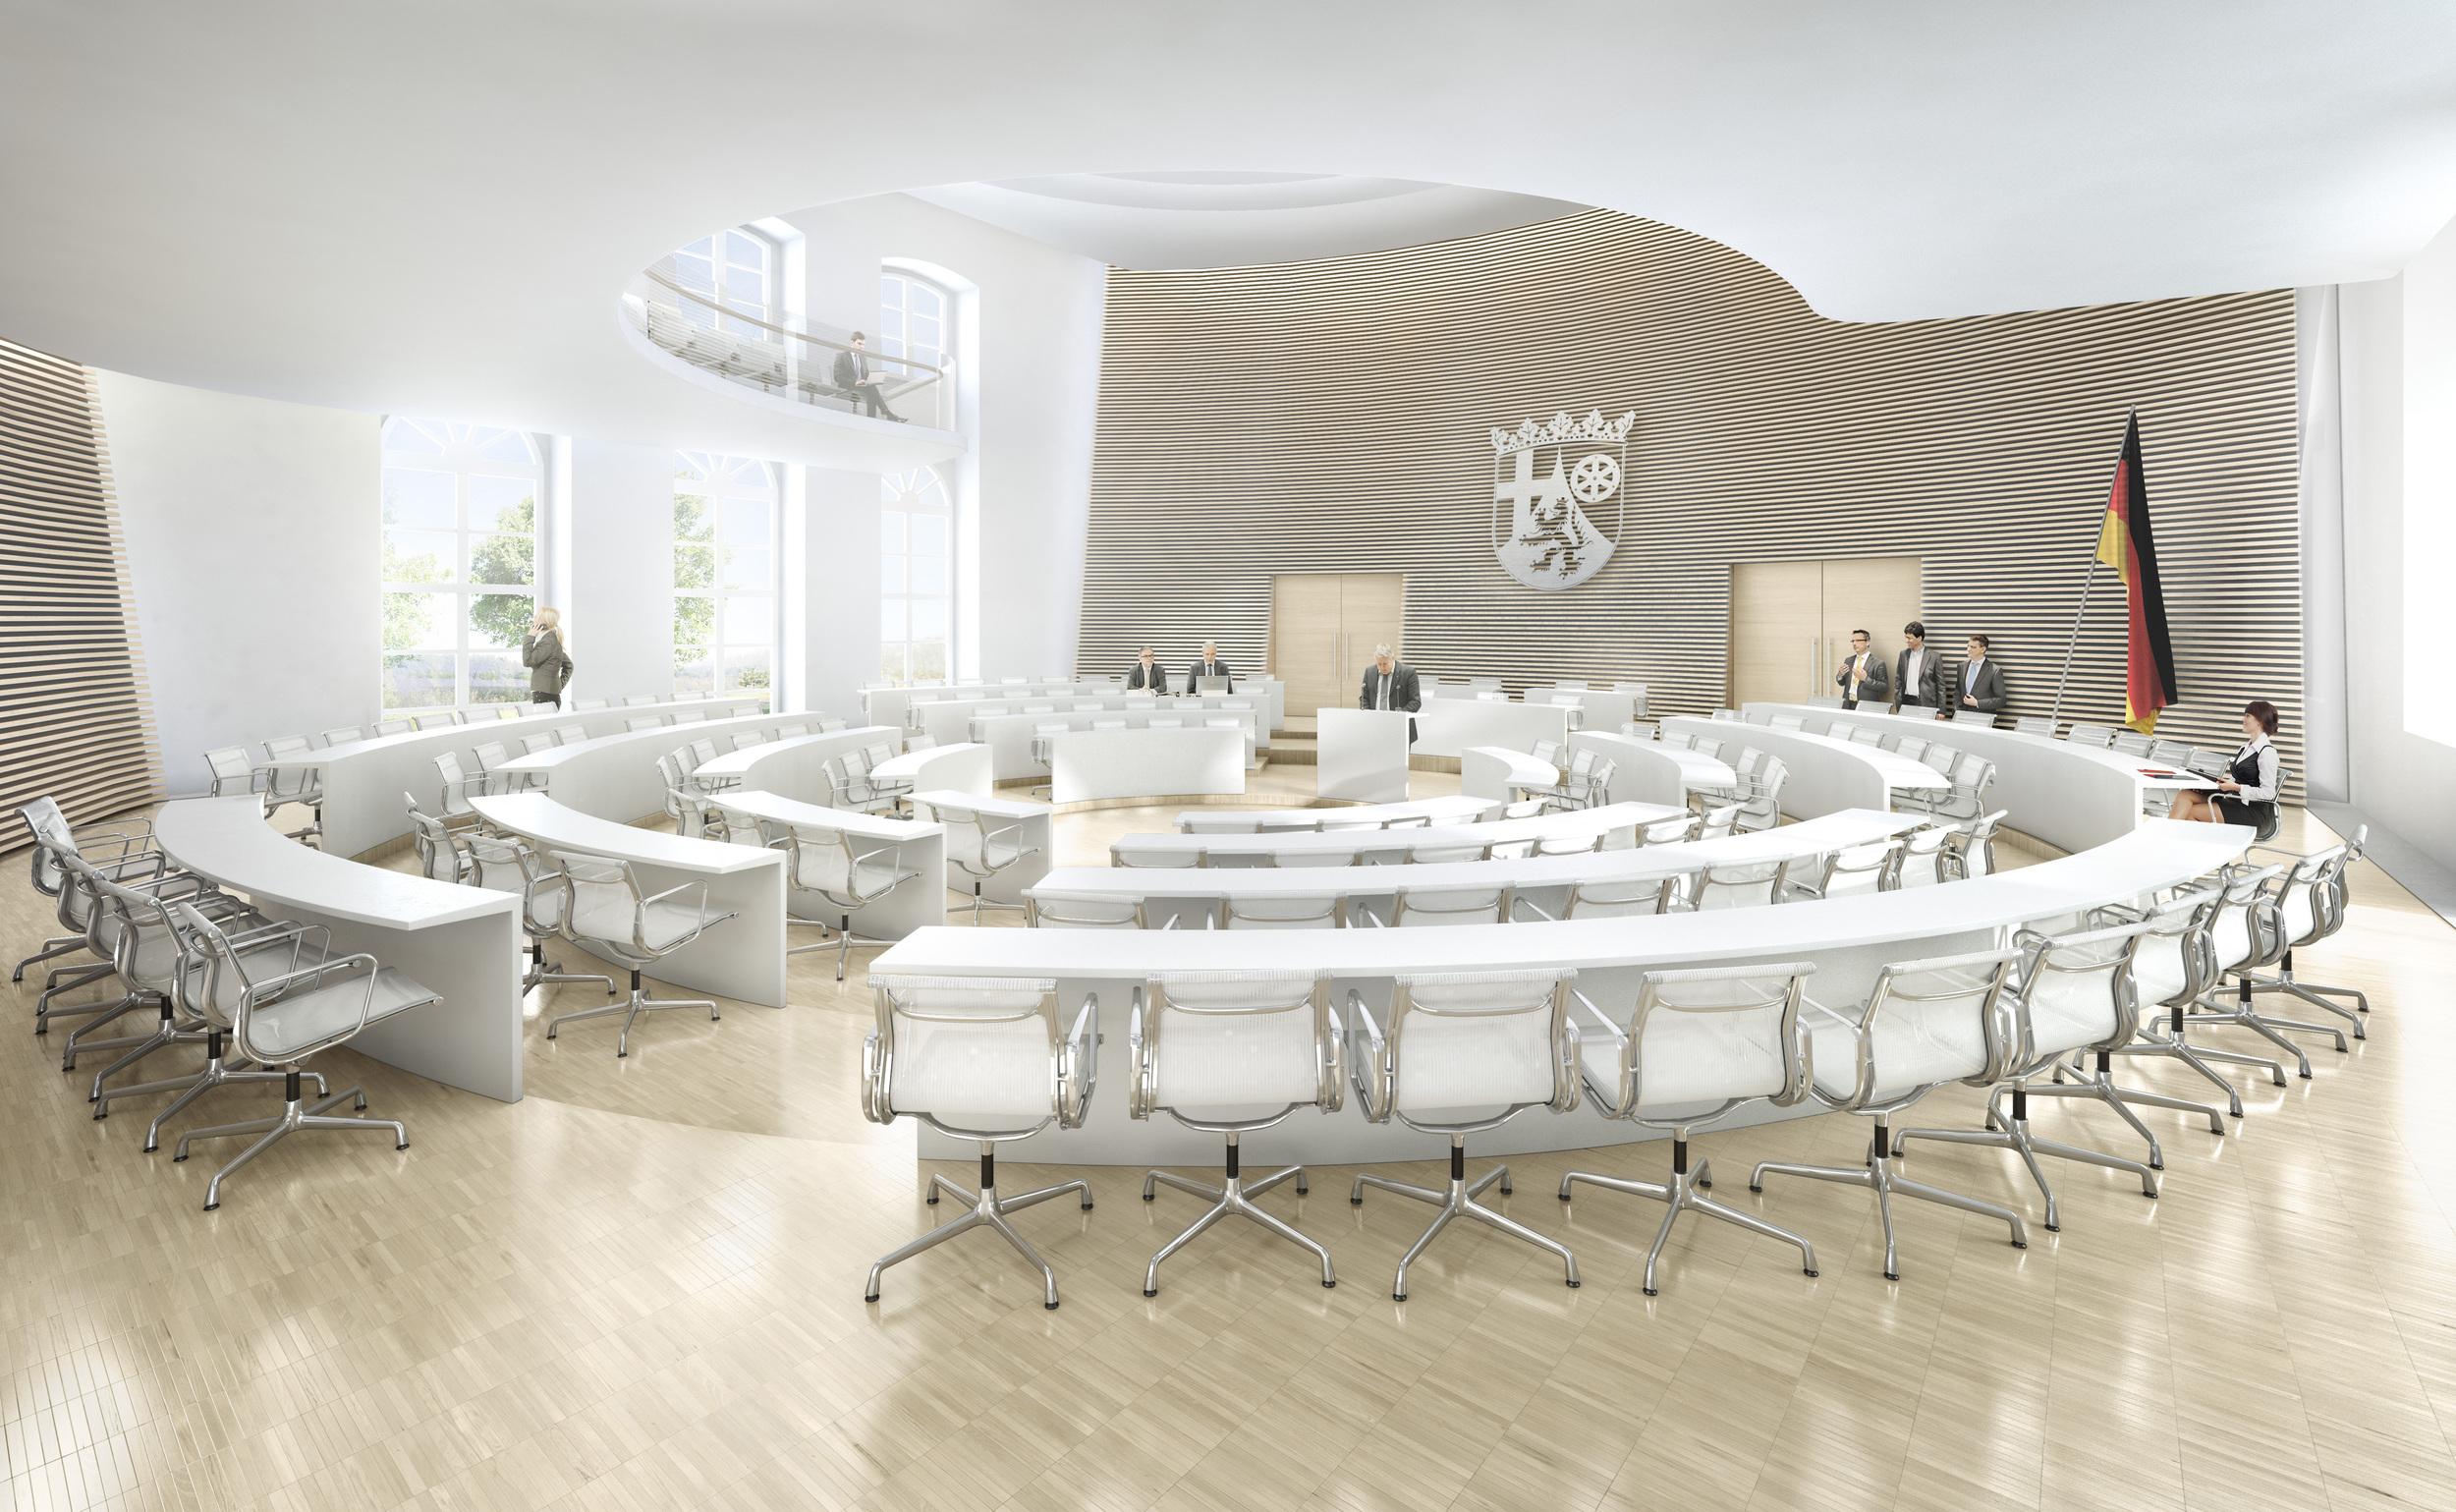 H4a_Mainzer_Landtag_Plenarsaal_hell.jpg